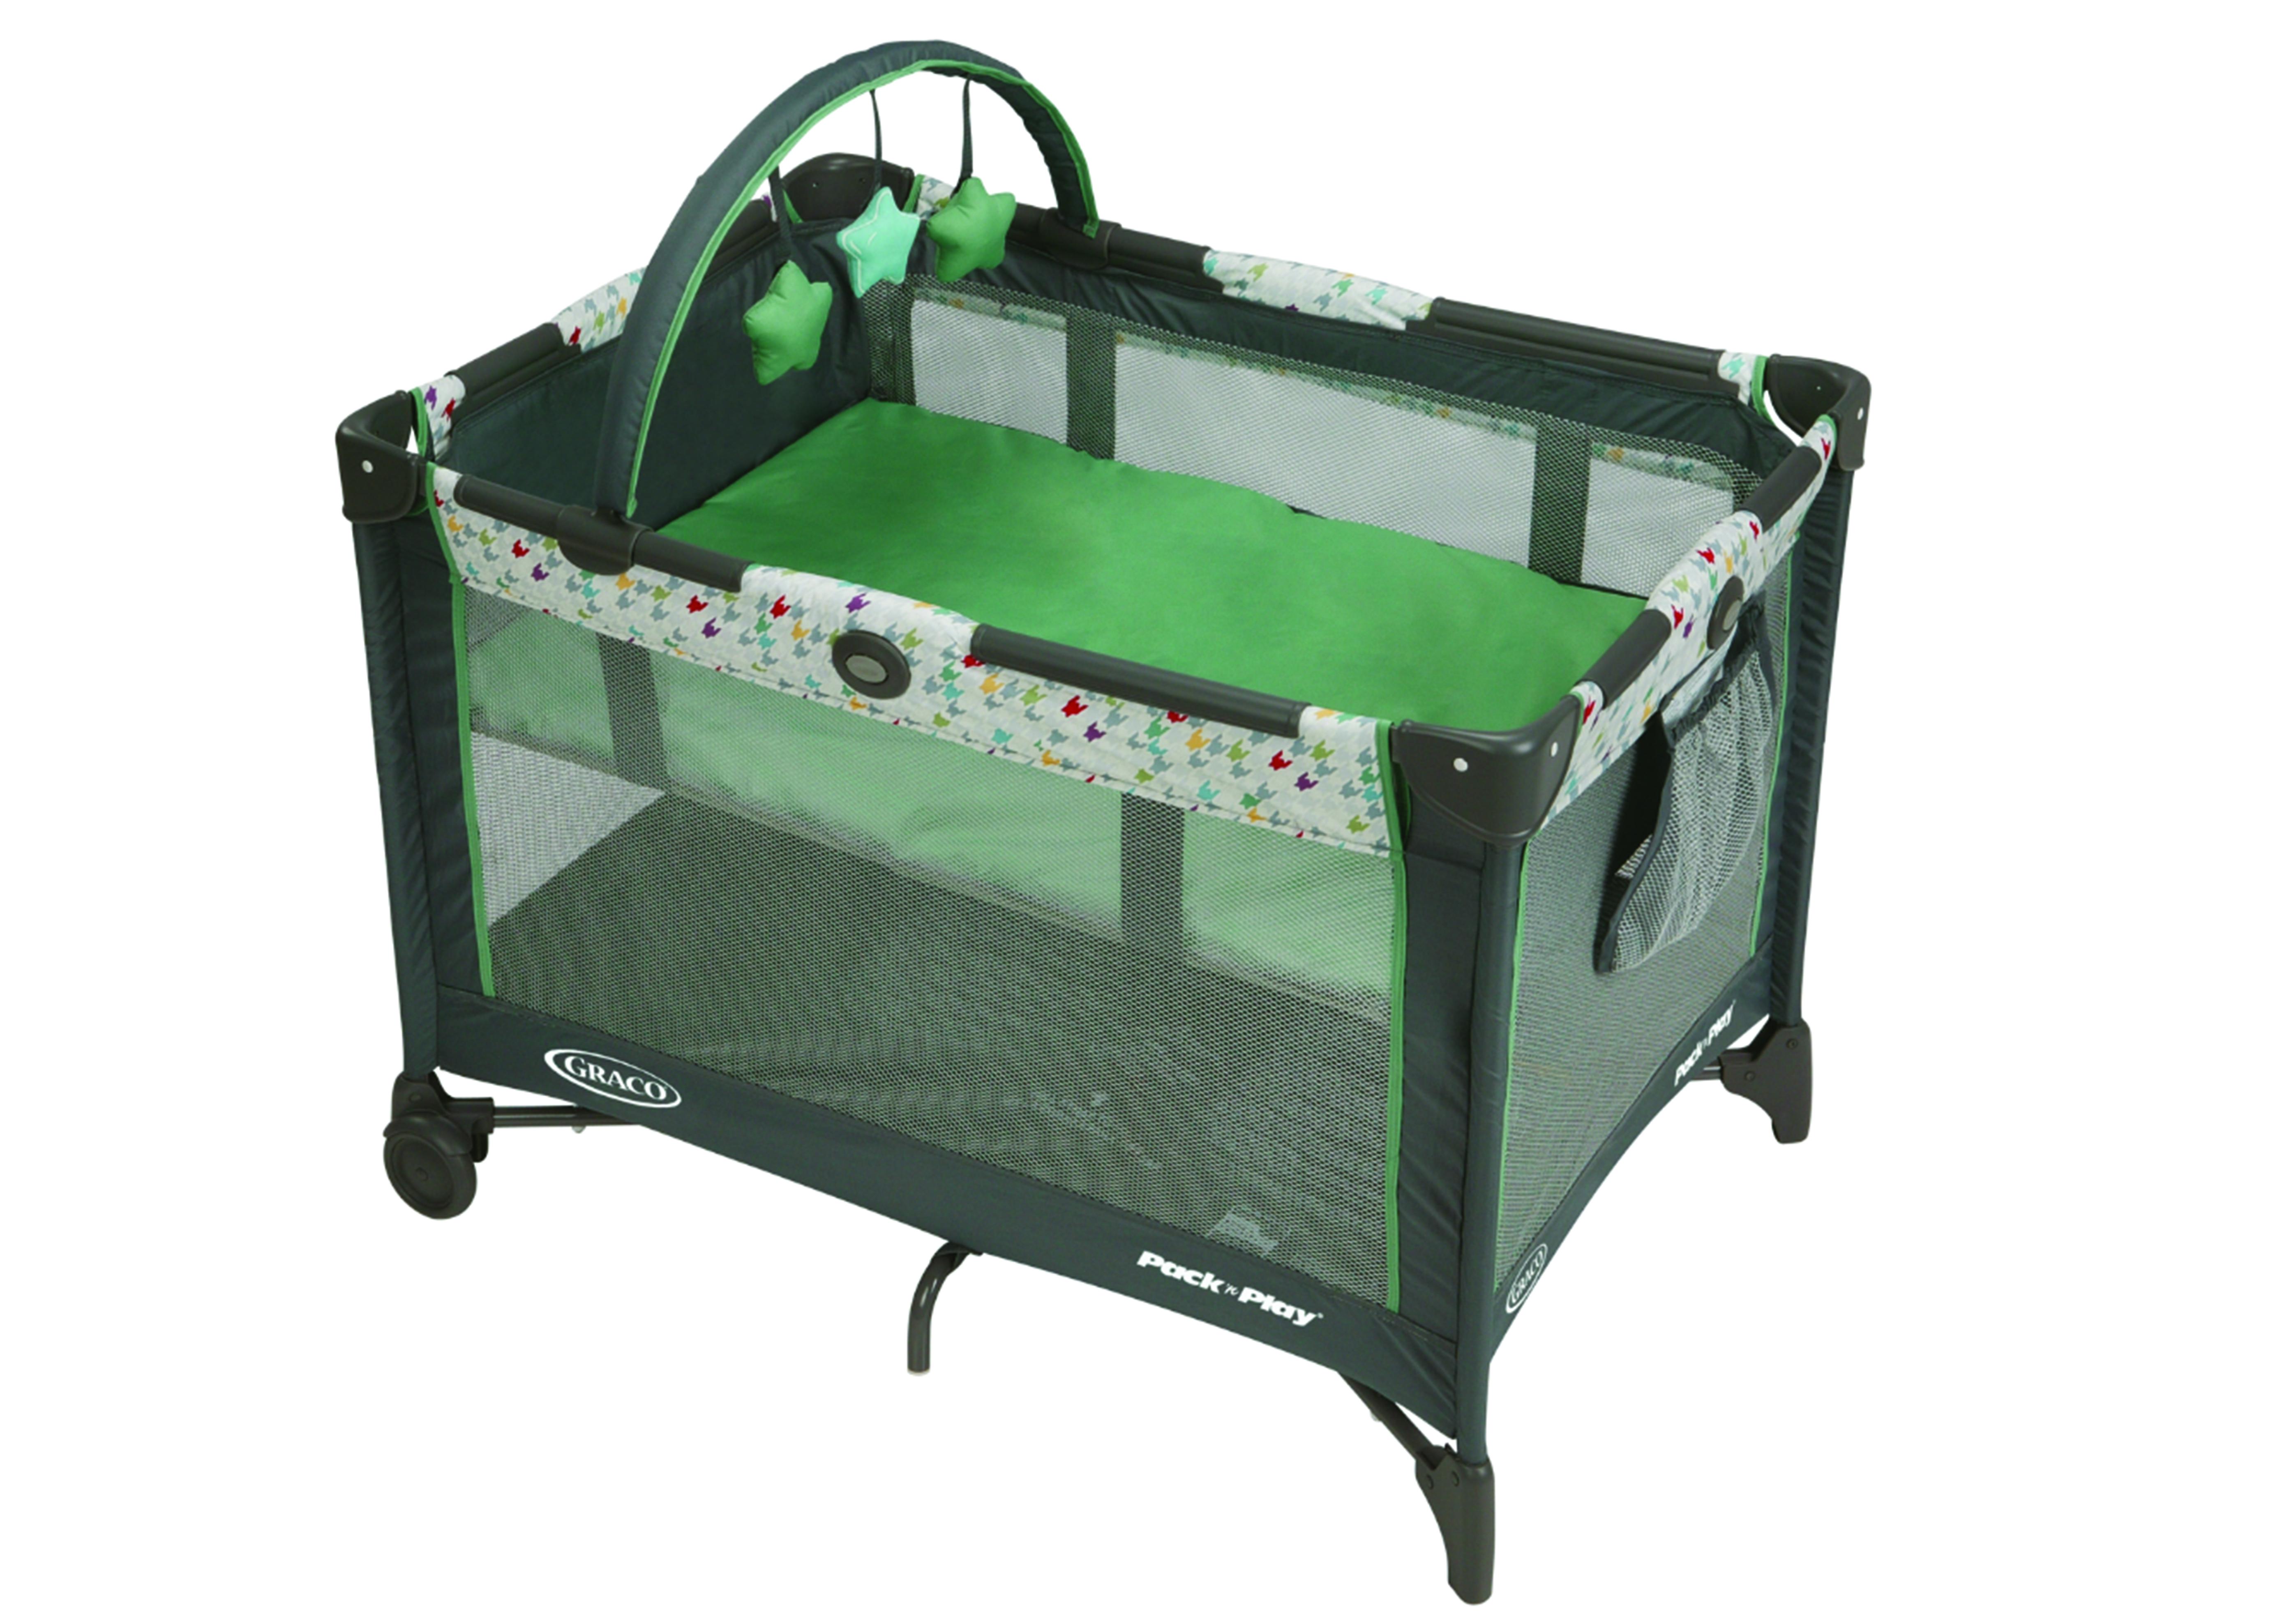 Mothercare | Graco Pnp Base Lambert Travel Cot Multicolor